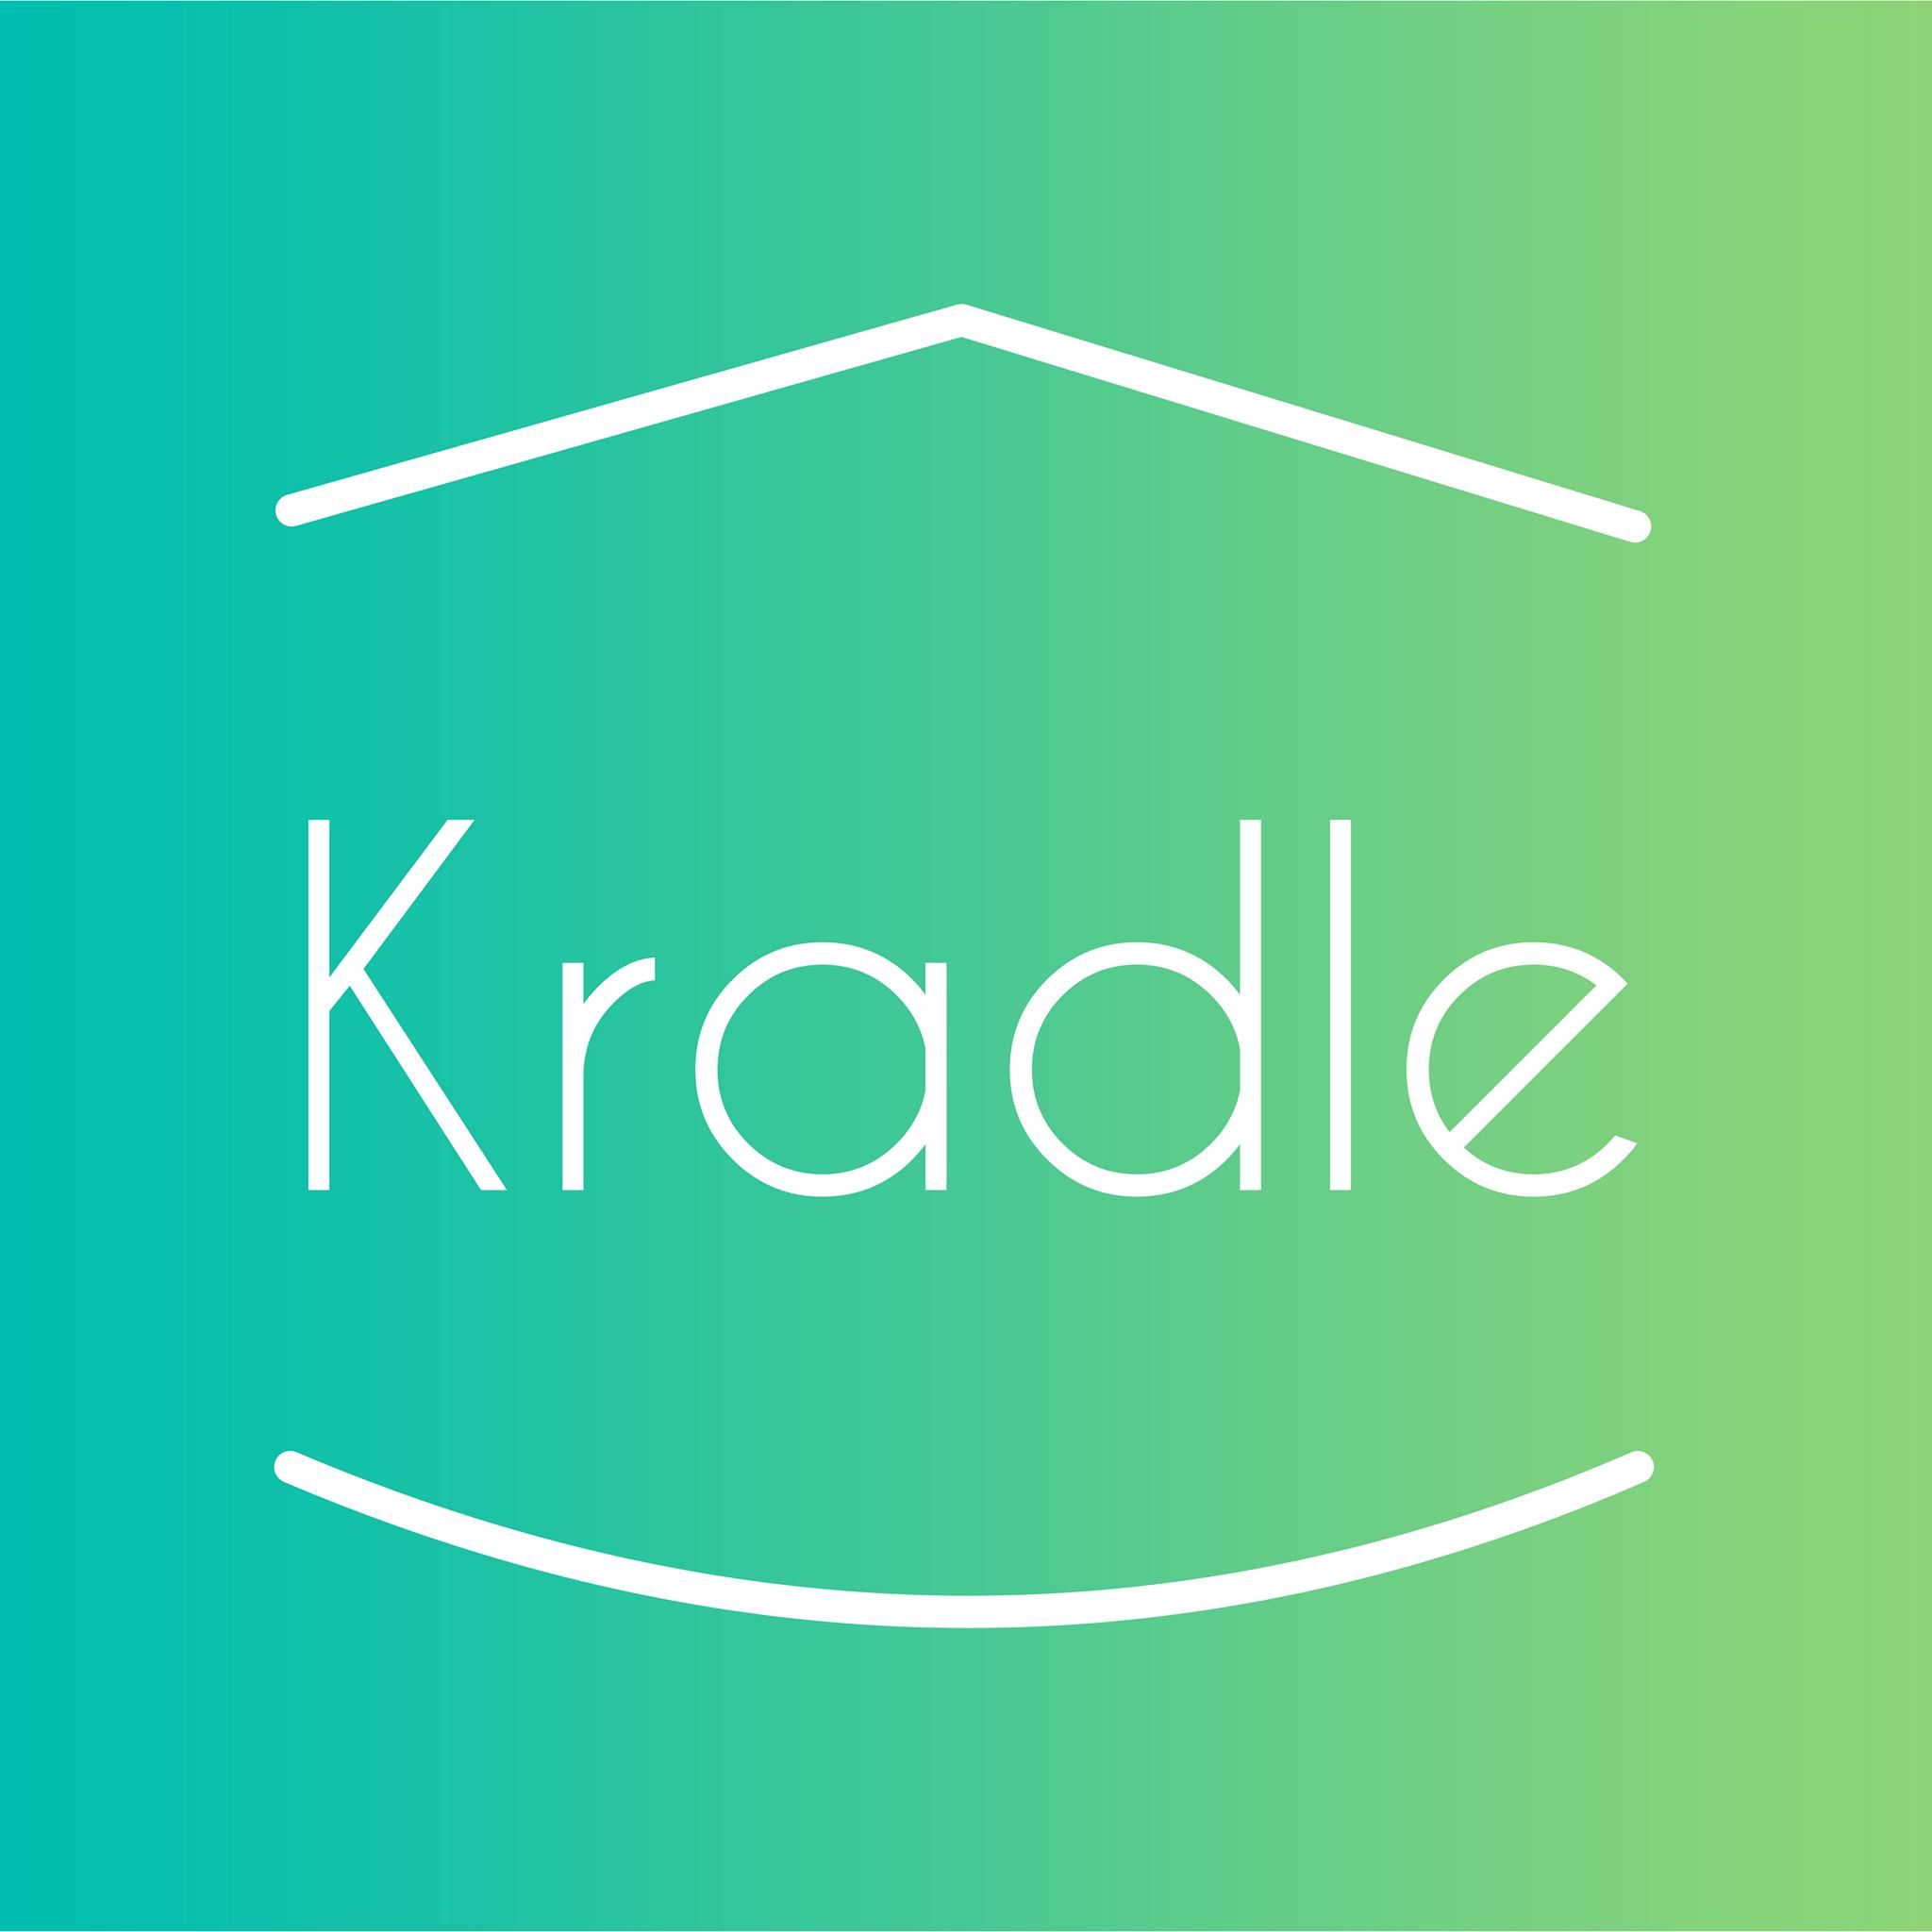 Kradle Homes - Coliving Company